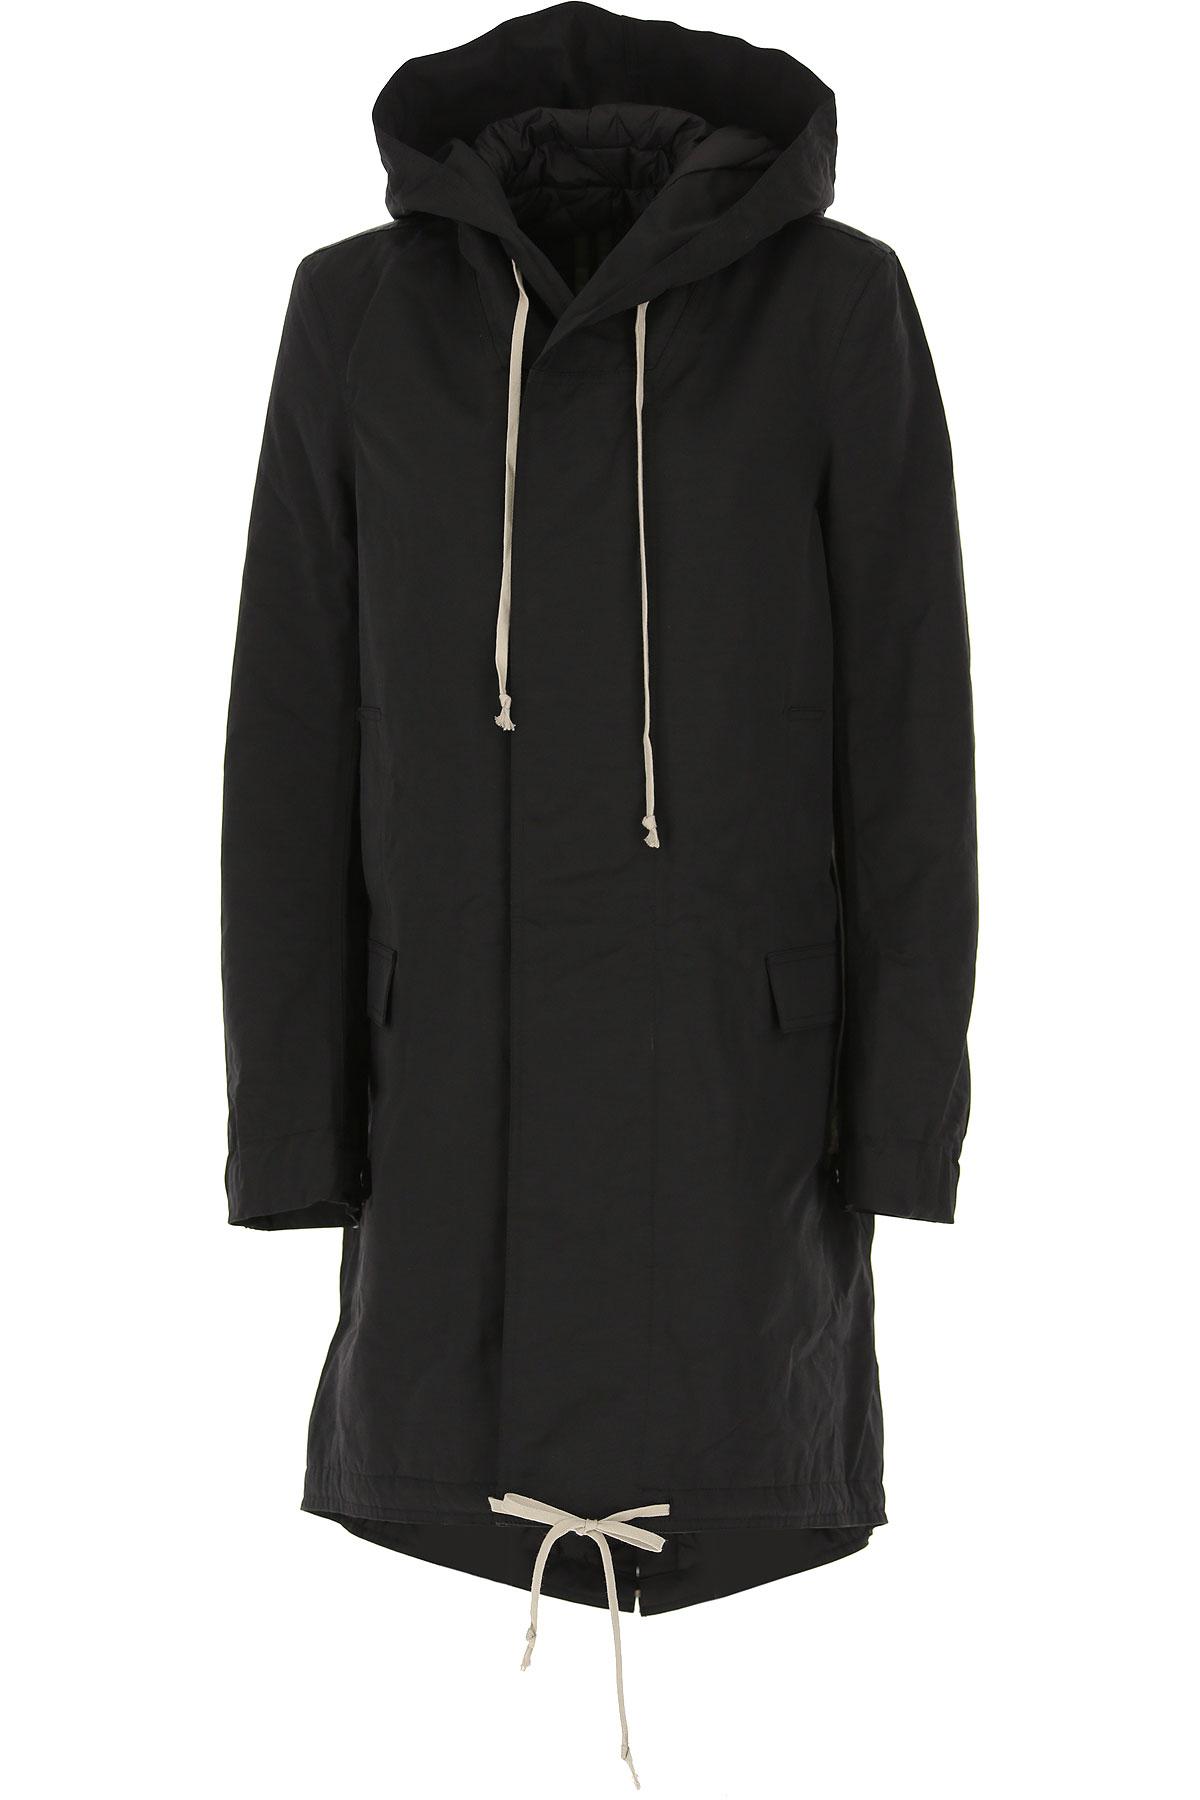 Rick Owens DRKSHDW Jacket for Women On Sale, Black, polyamide, 2019, 2 6